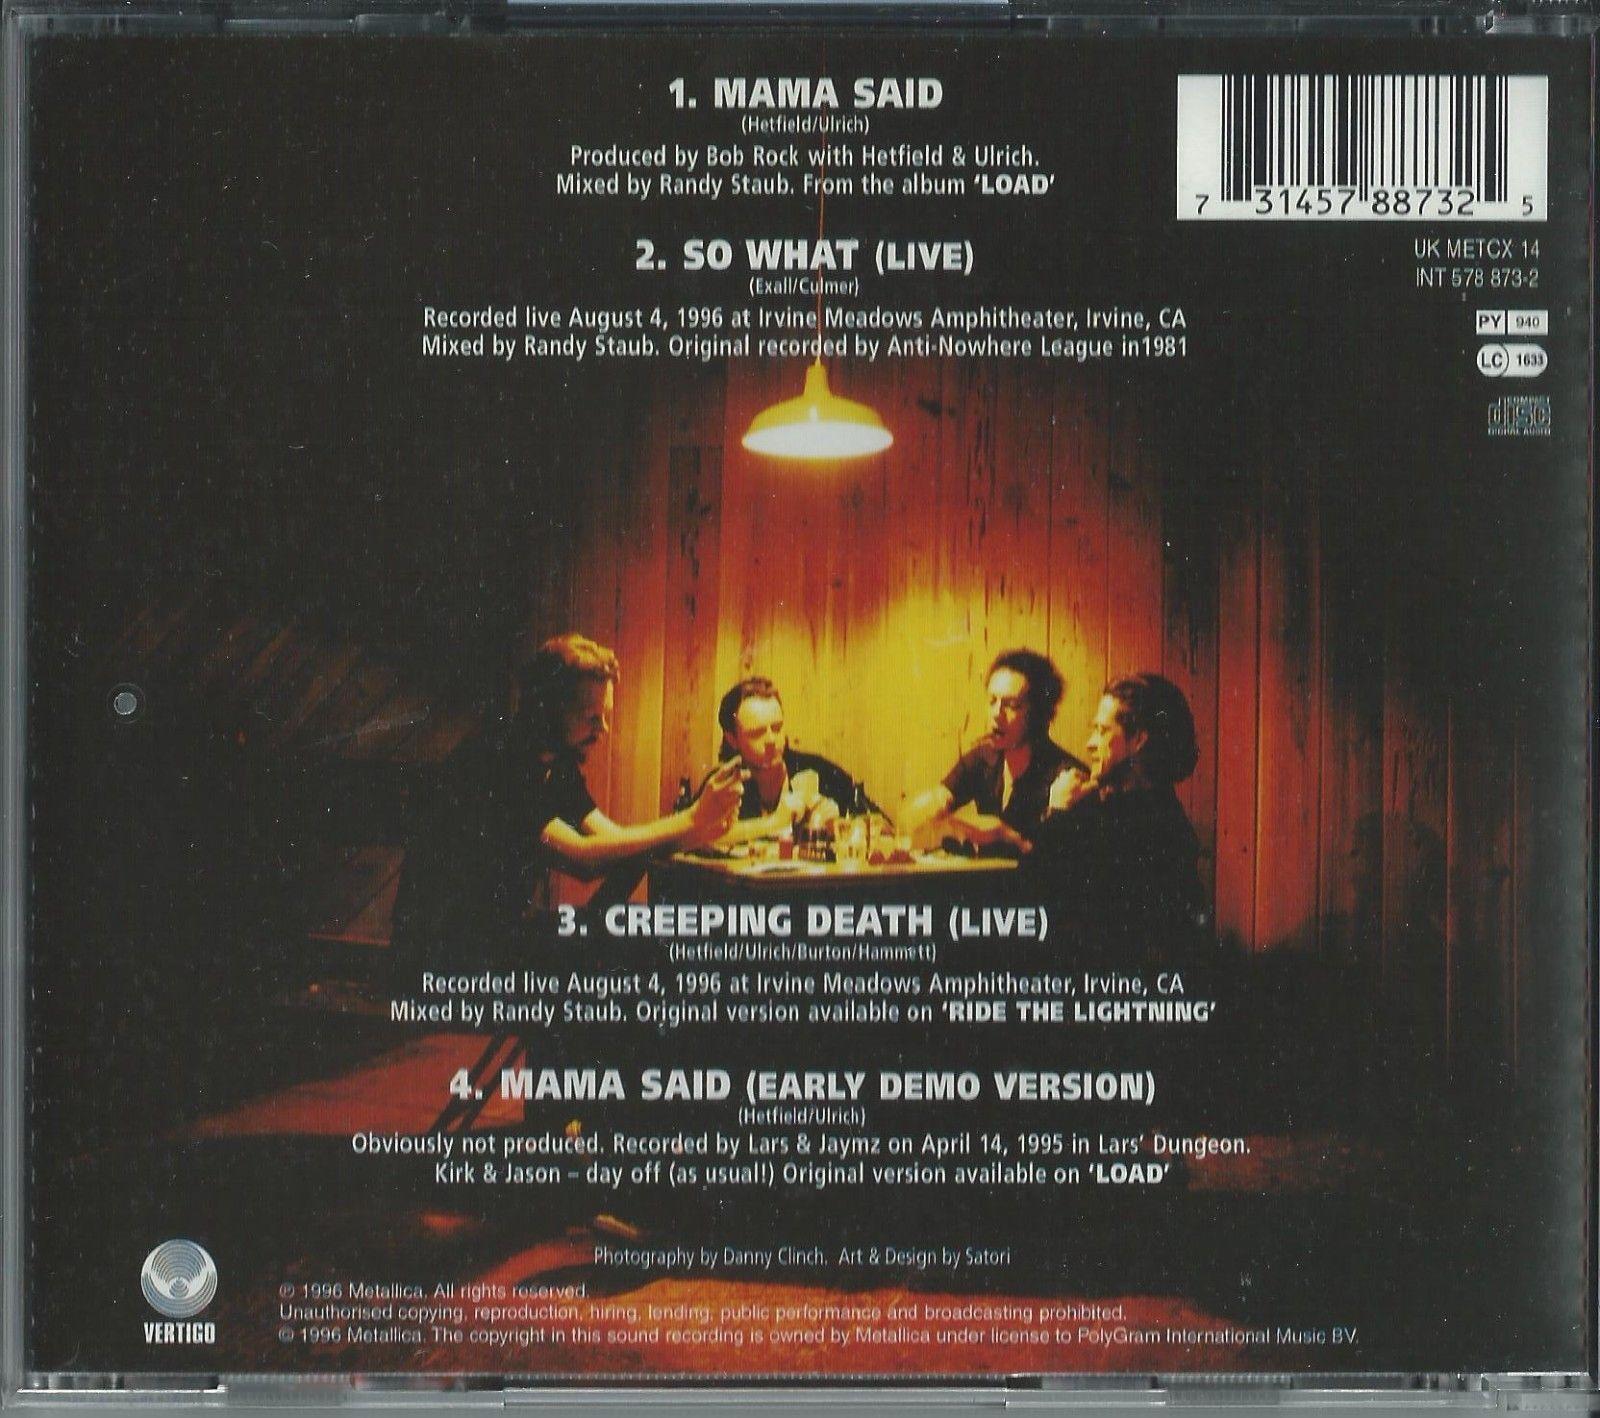 METALLICA - MAMA SAID 1996 UK CD SINGLE PART 2 VERTIGO METCX 14